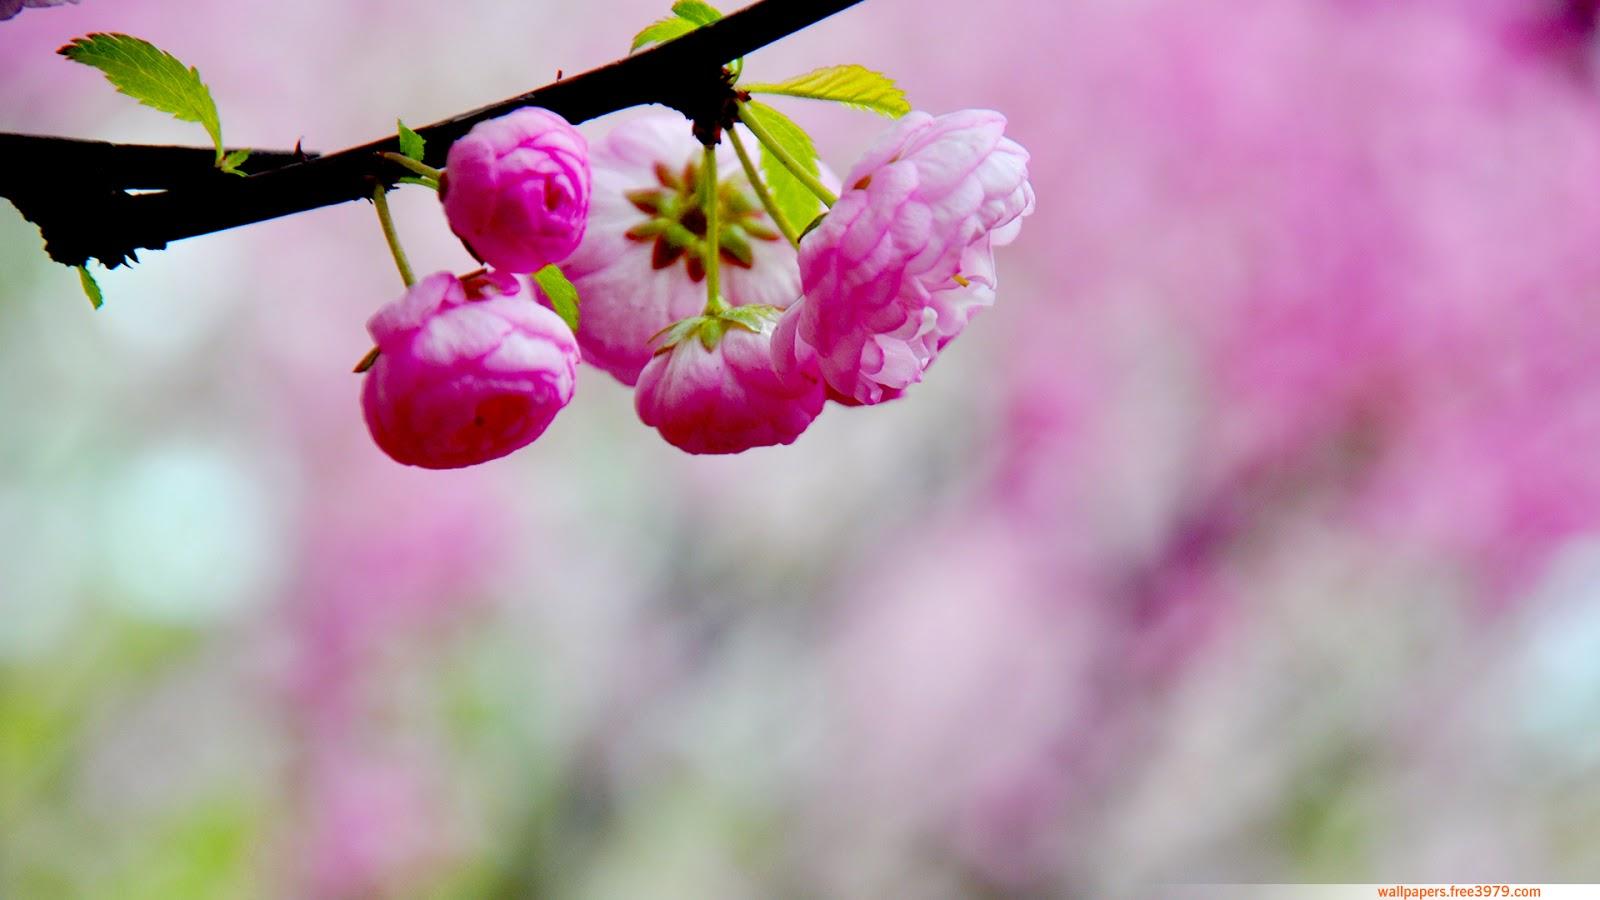 peach blossoms wallpaper - photo #25